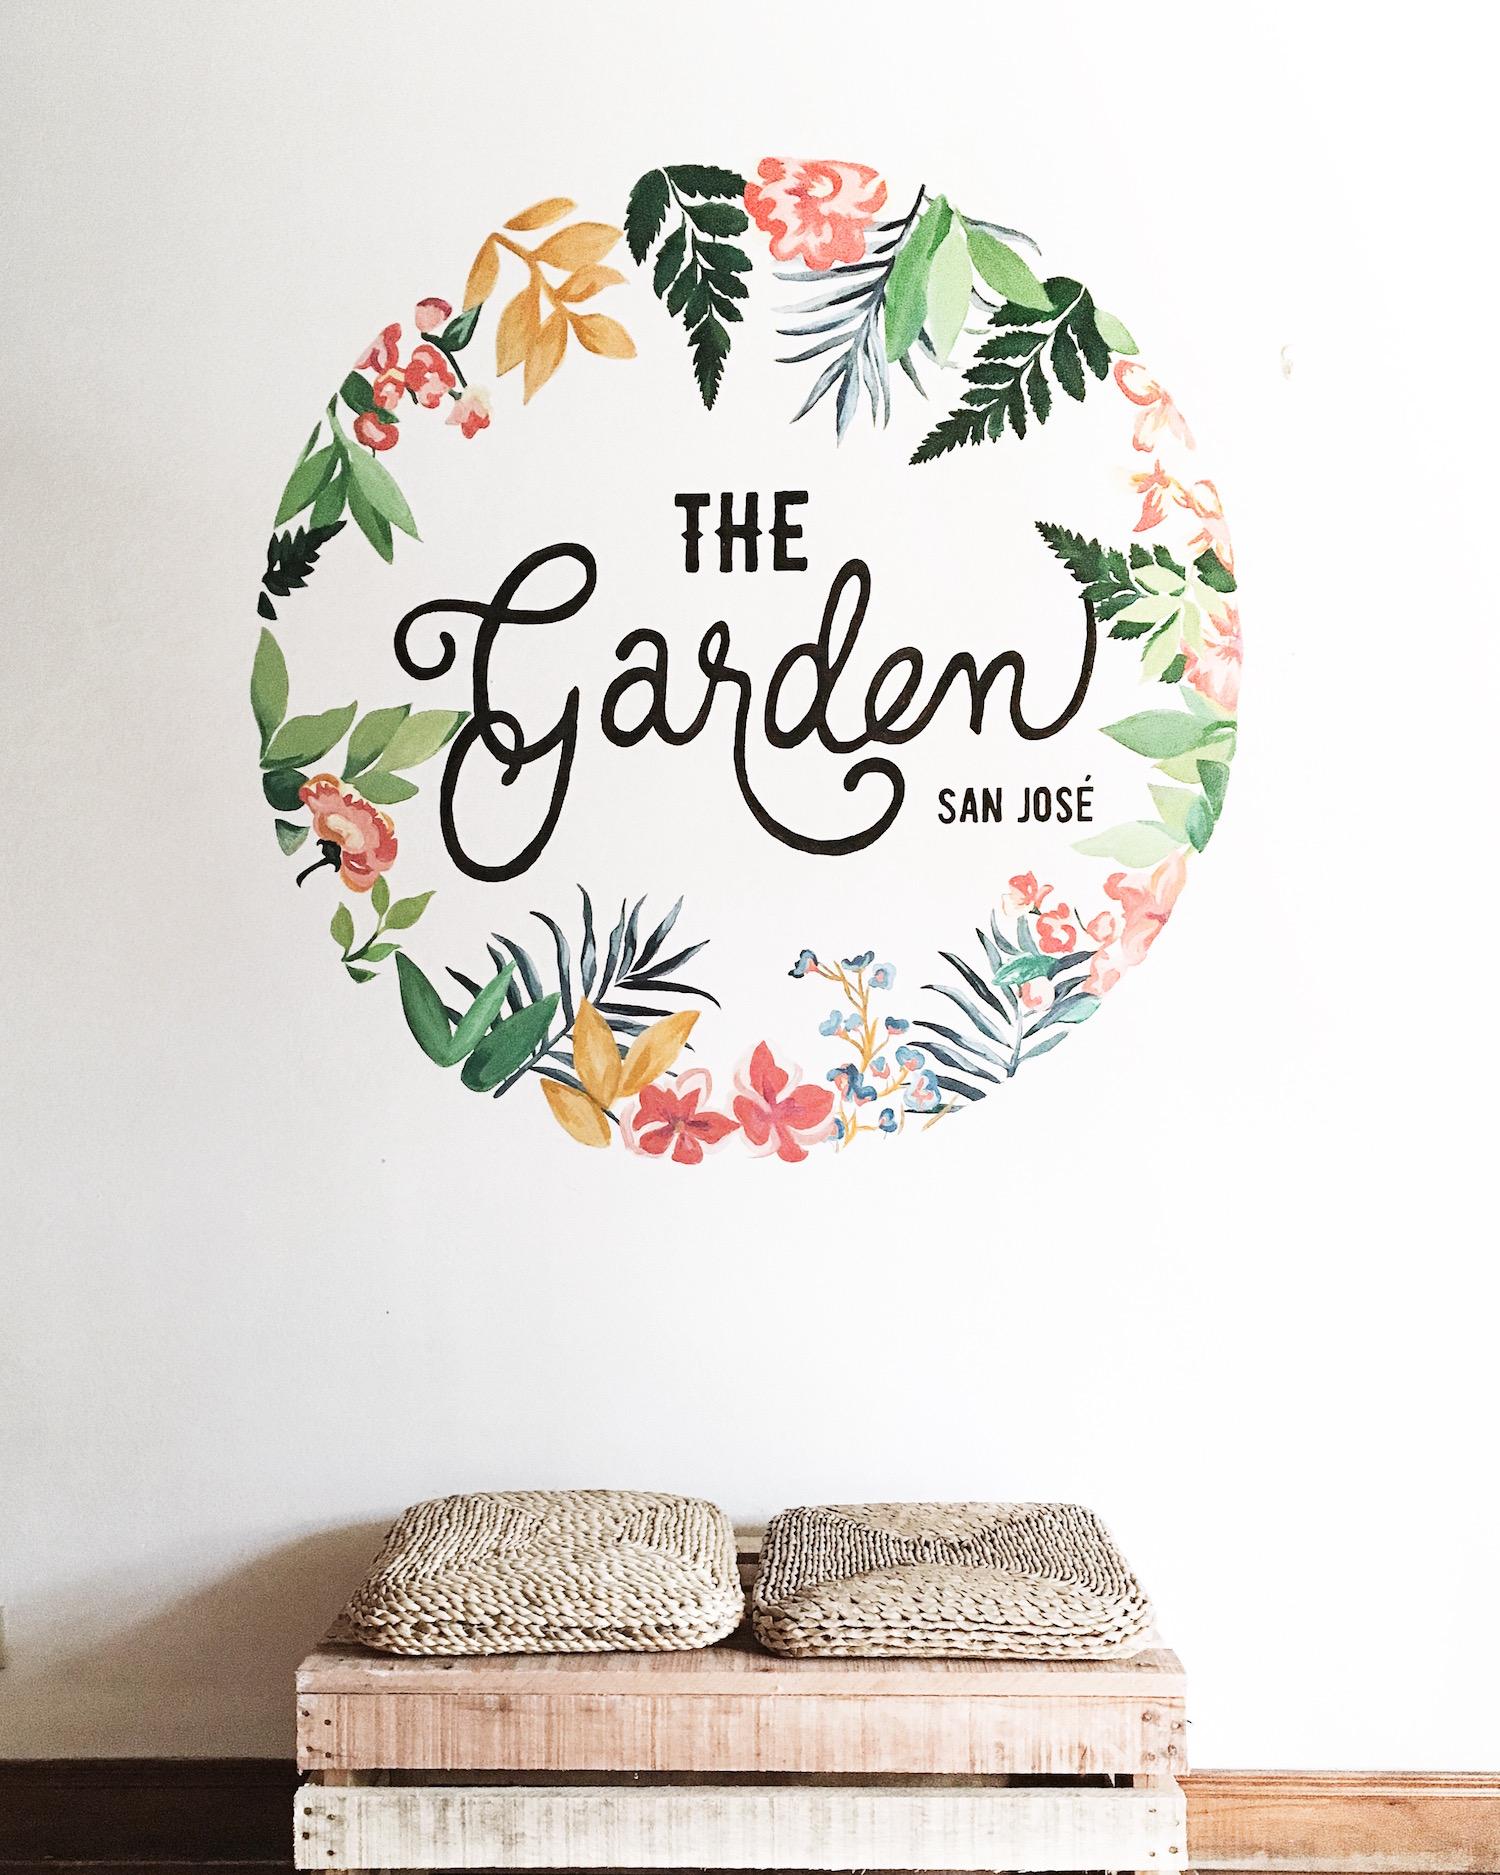 wander-south-costa-rica-the-garden-1.jpg